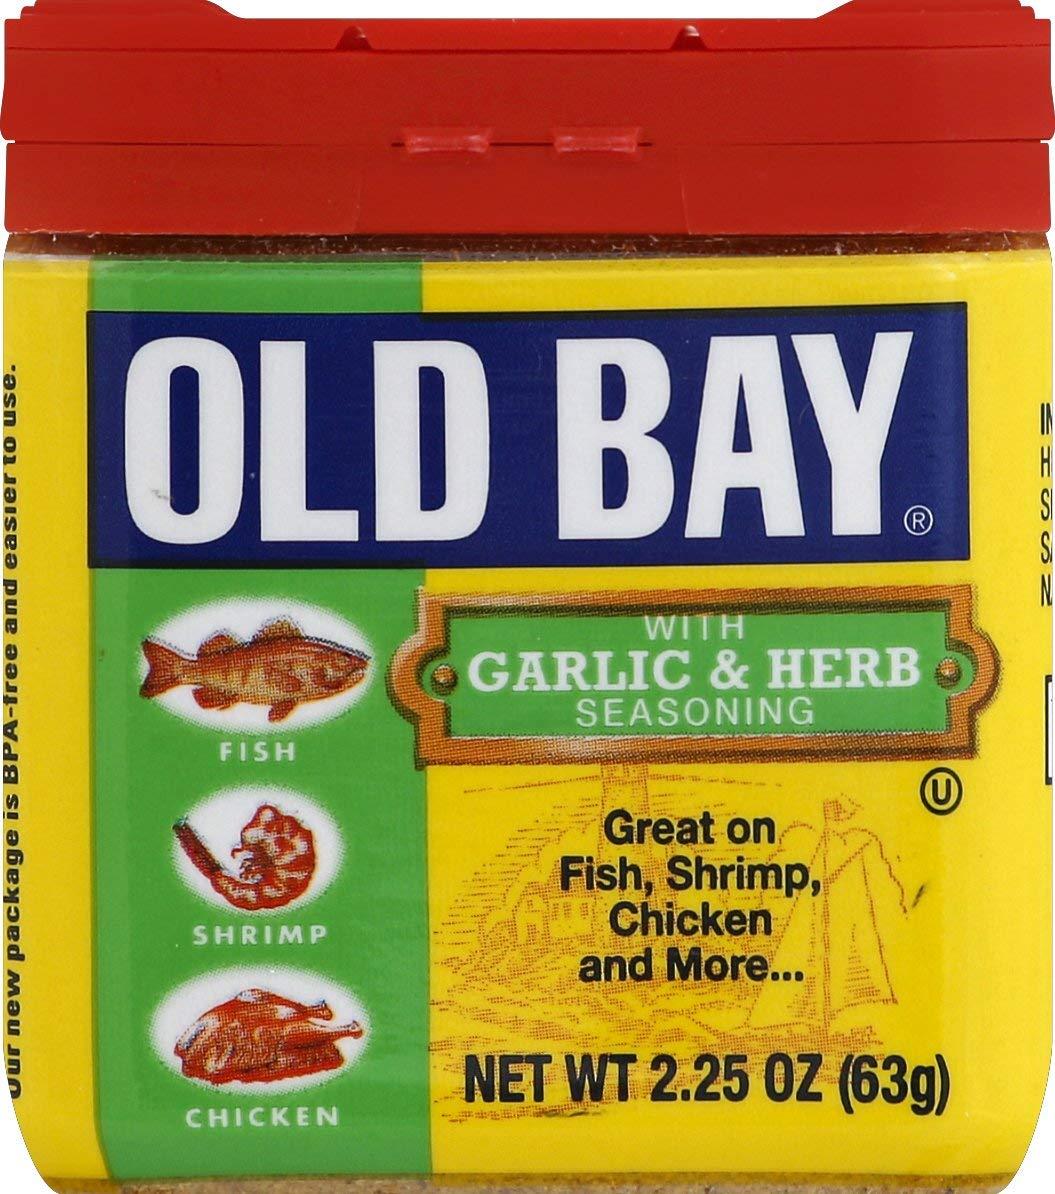 Old Nippon regular agency Bay New product Seasoning Garlic 2.25 Herb oz